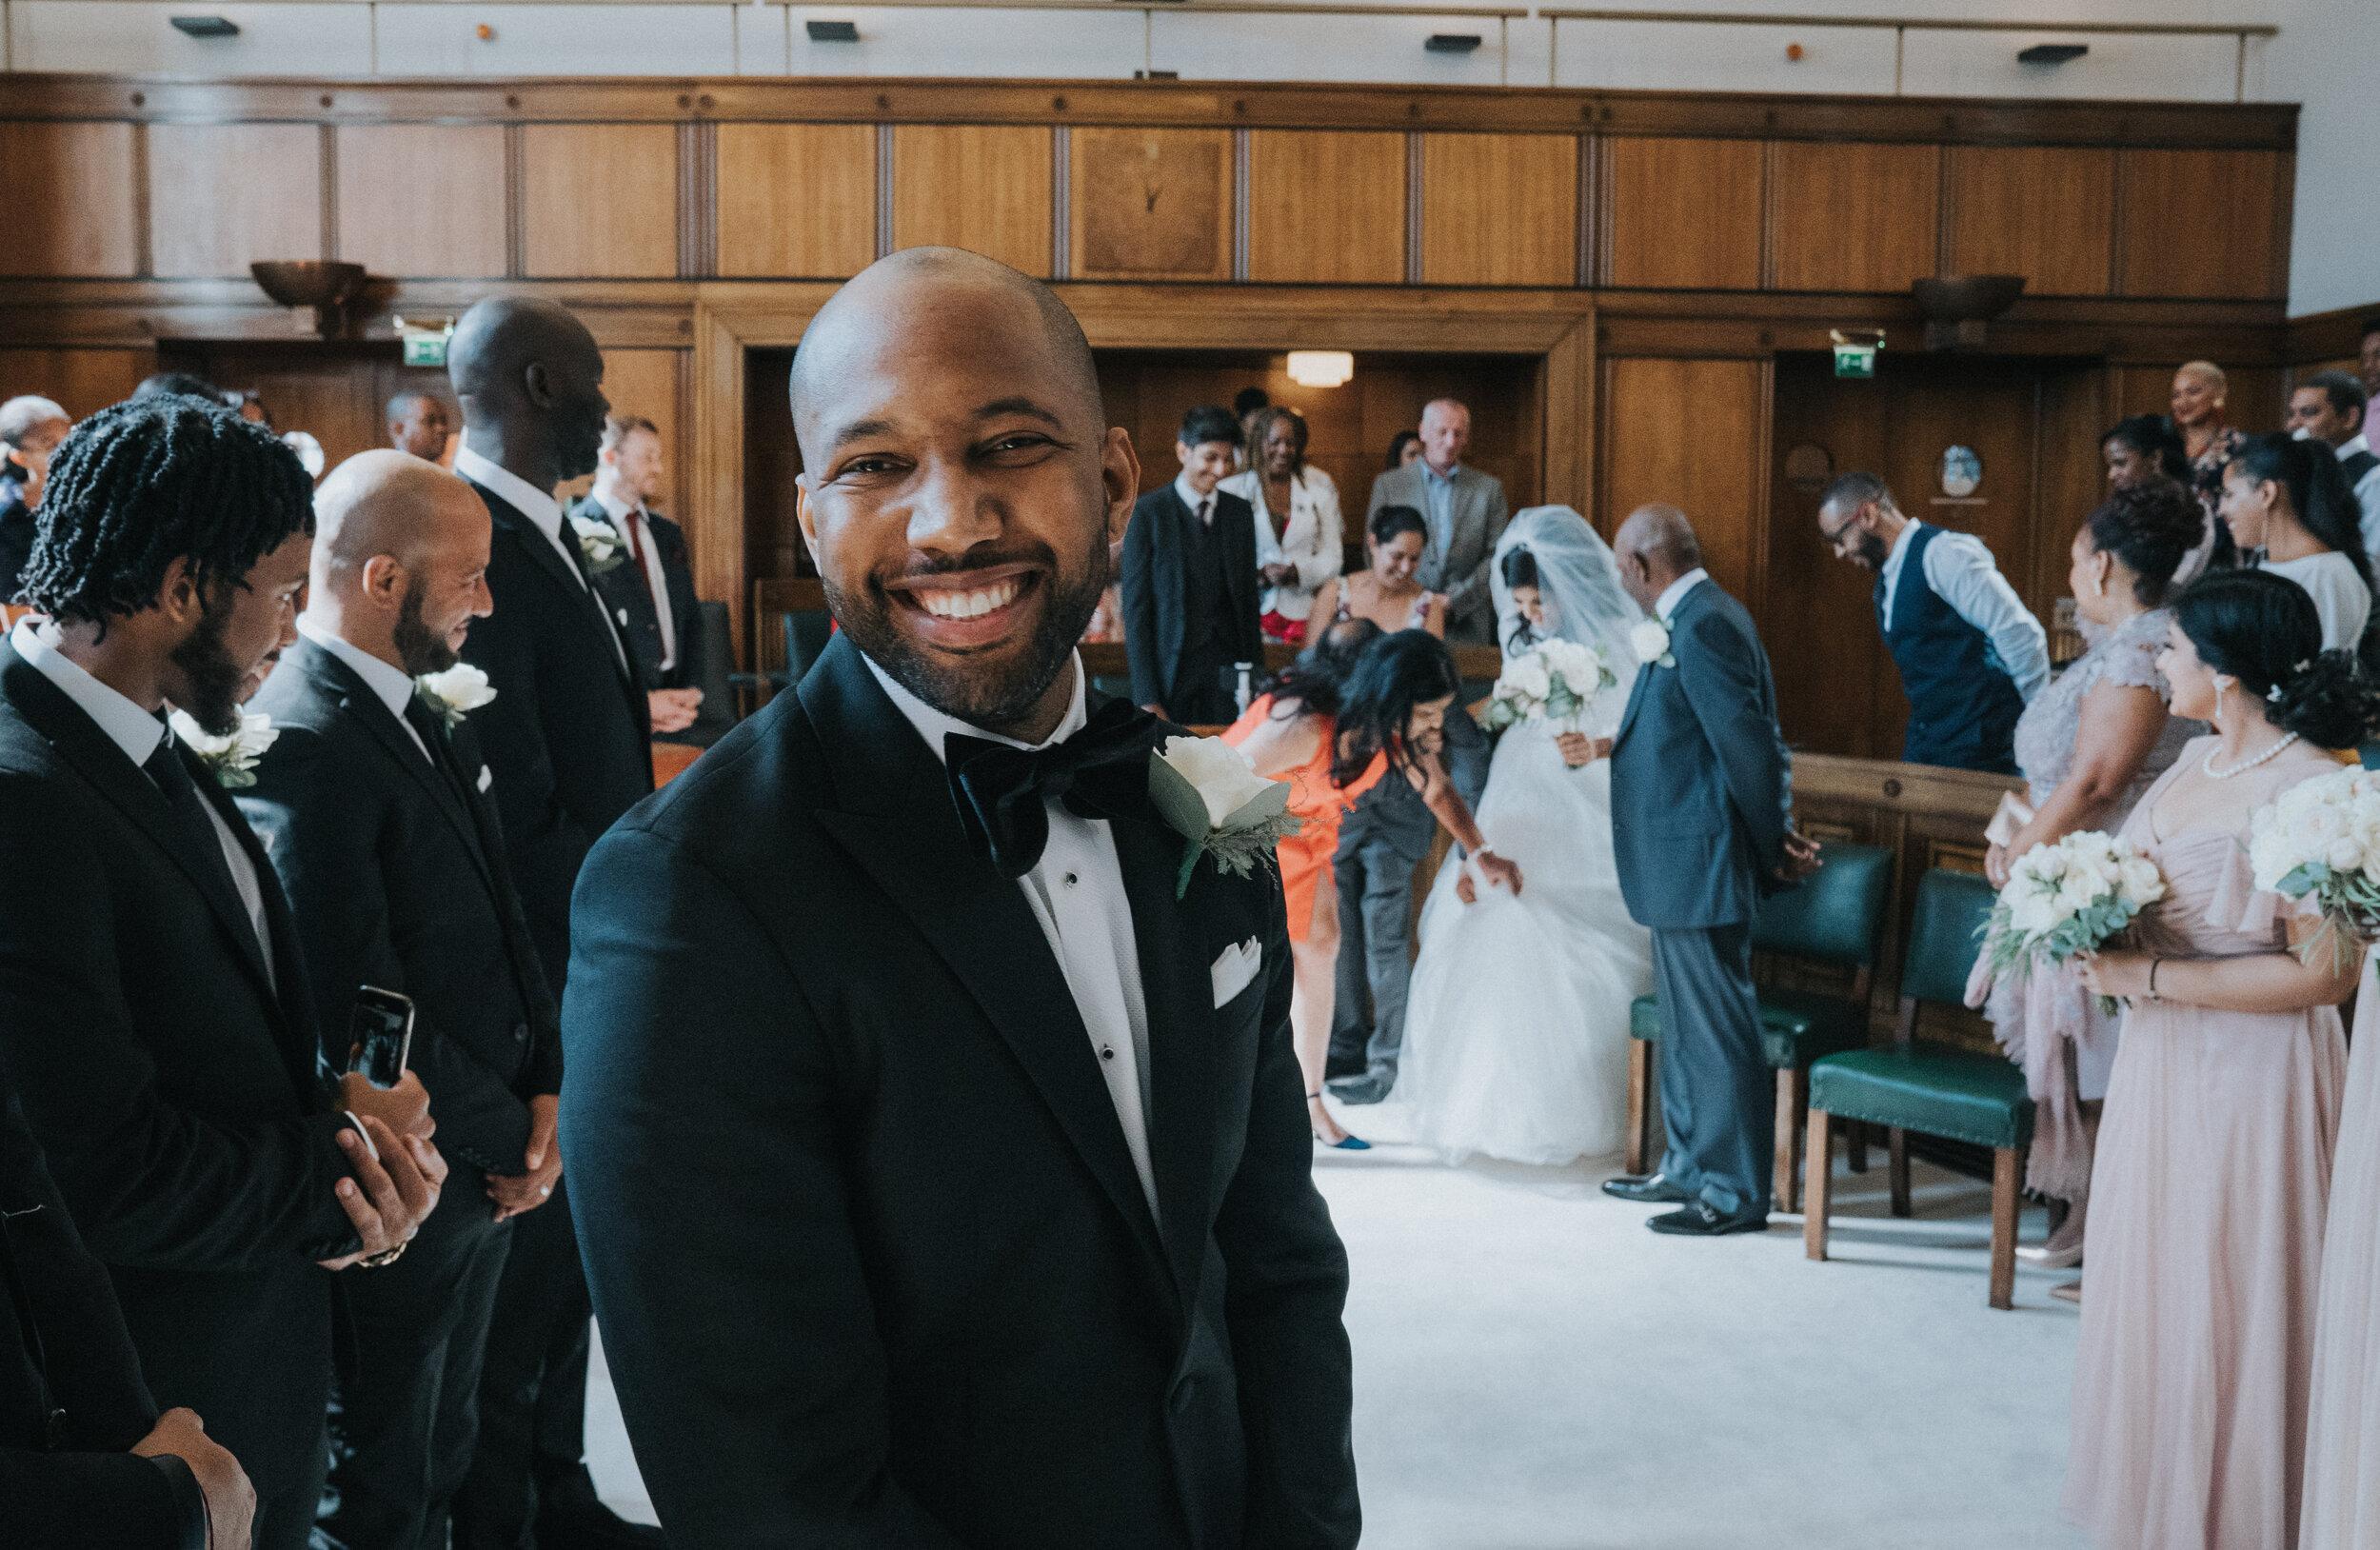 east-london-wedding-photographer-videographer-patriot-square-apartments-29